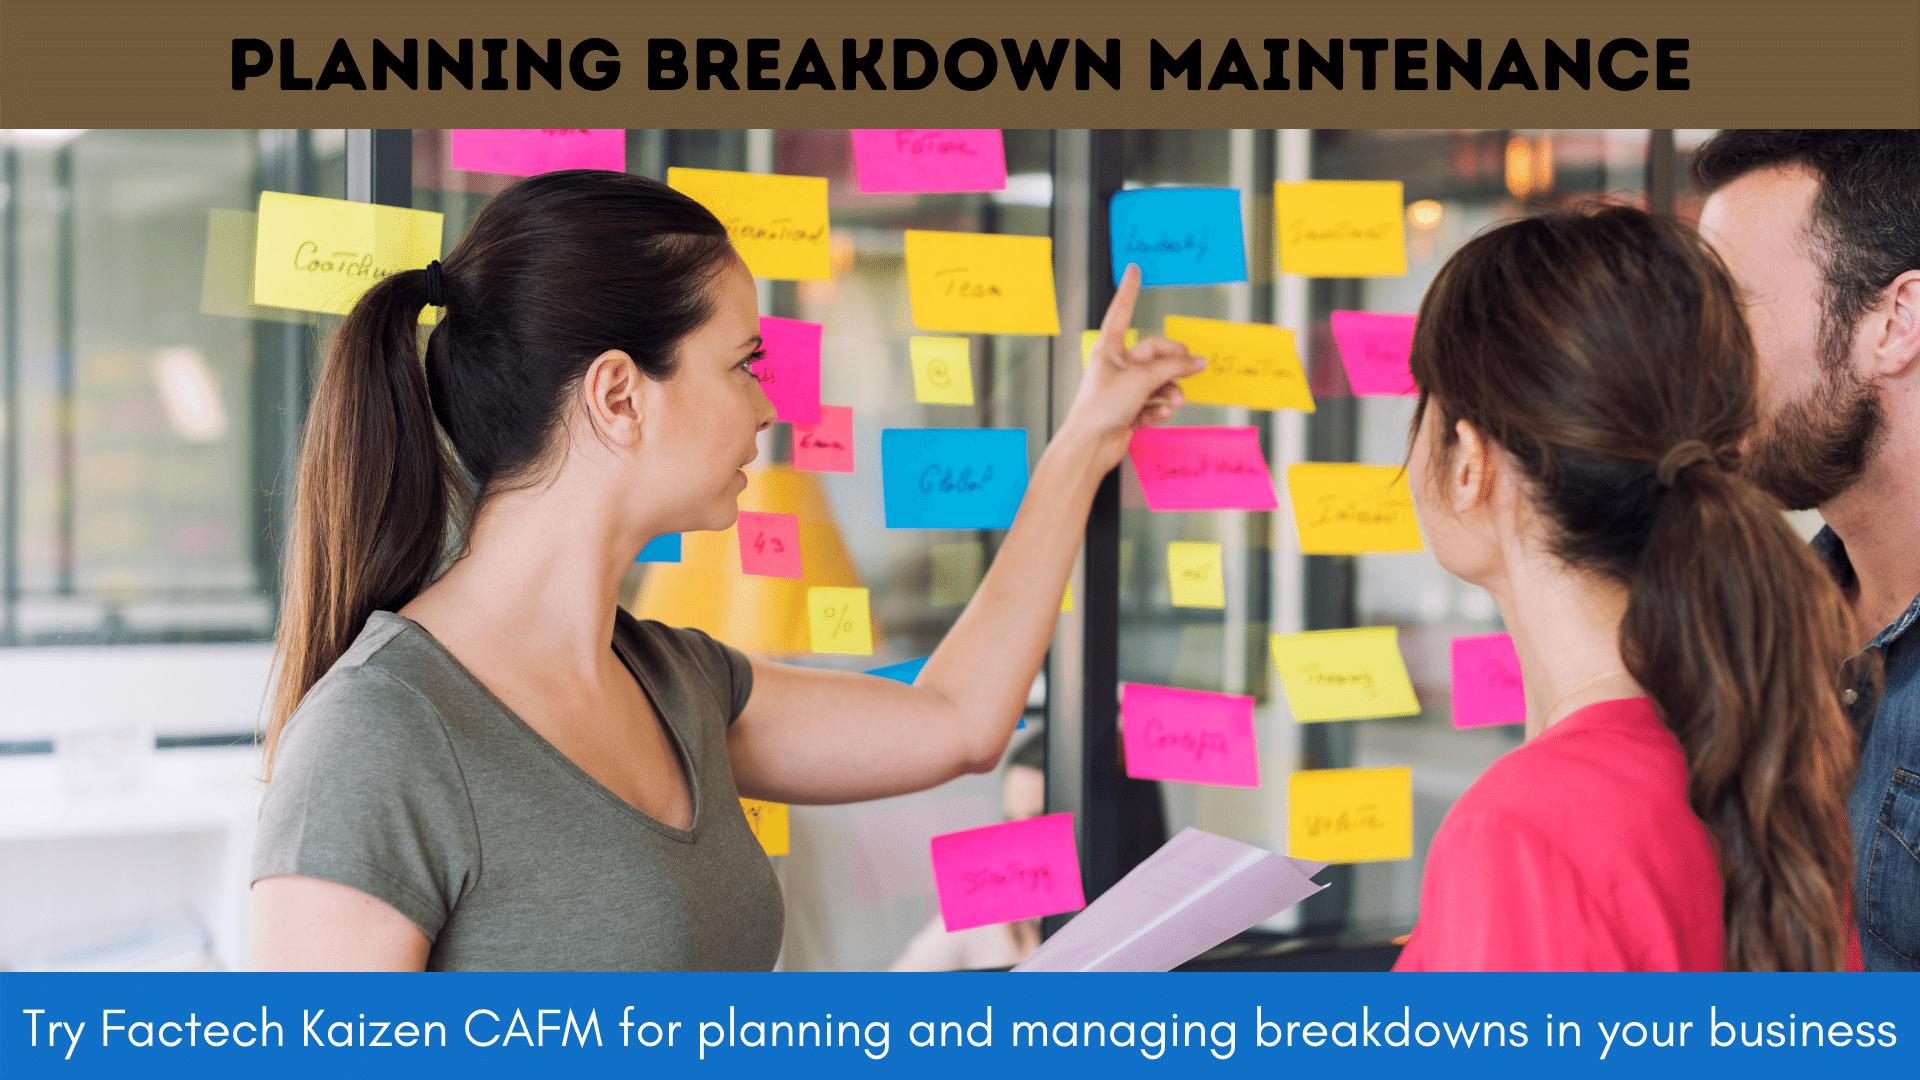 how to plan breakdown maintenance